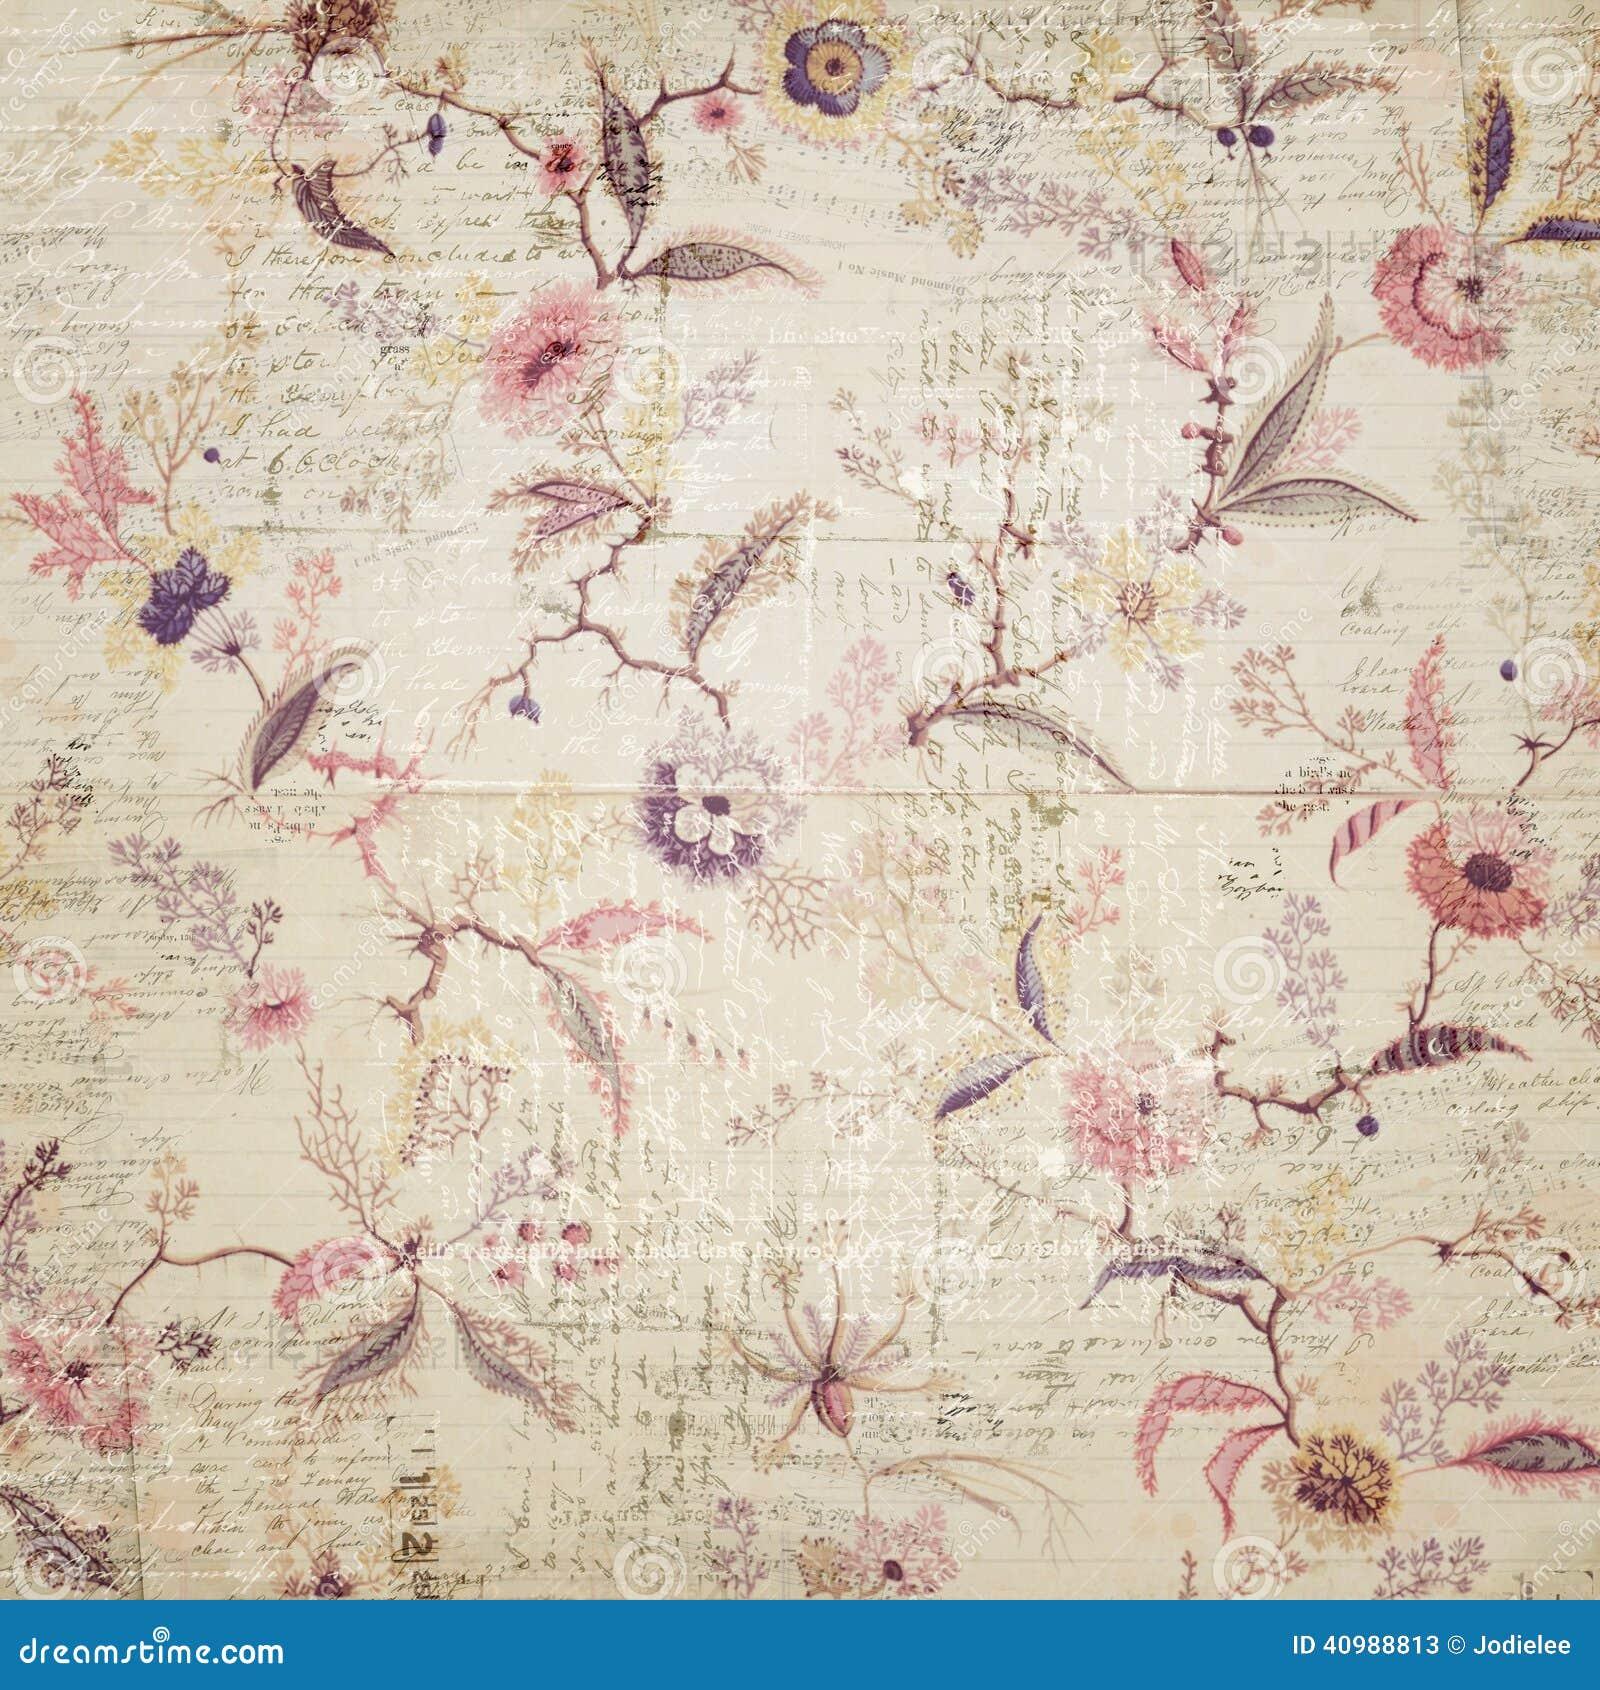 Vintage floral wallpaper stock image image of floral - Papeles pintados vintage ...